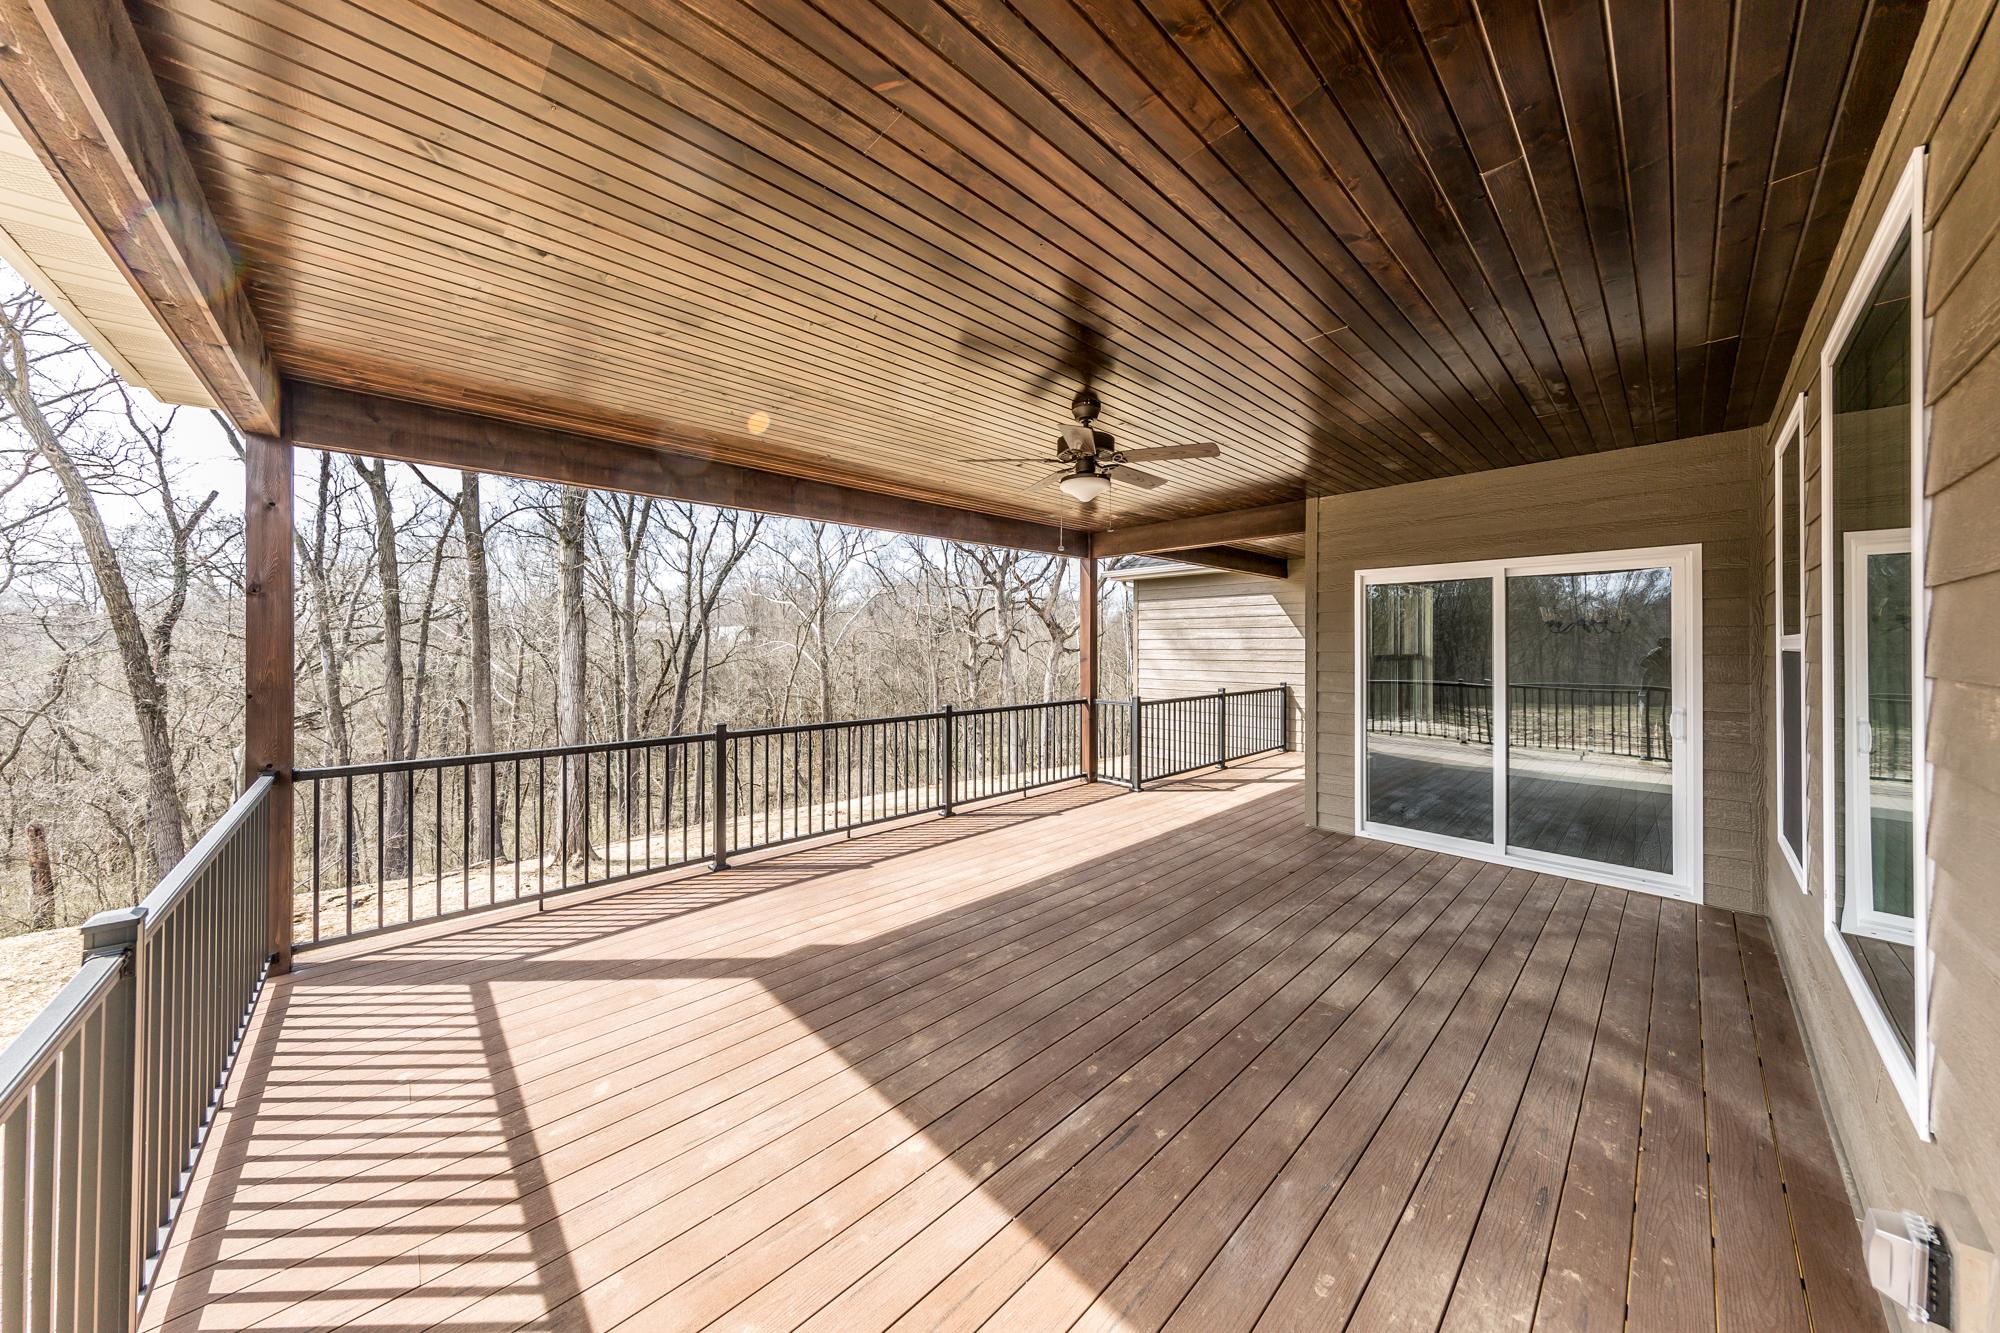 New-Construction-For-Sale-Bethel-Ridge-Farms-Scott-AFB-Illinois-47.jpg